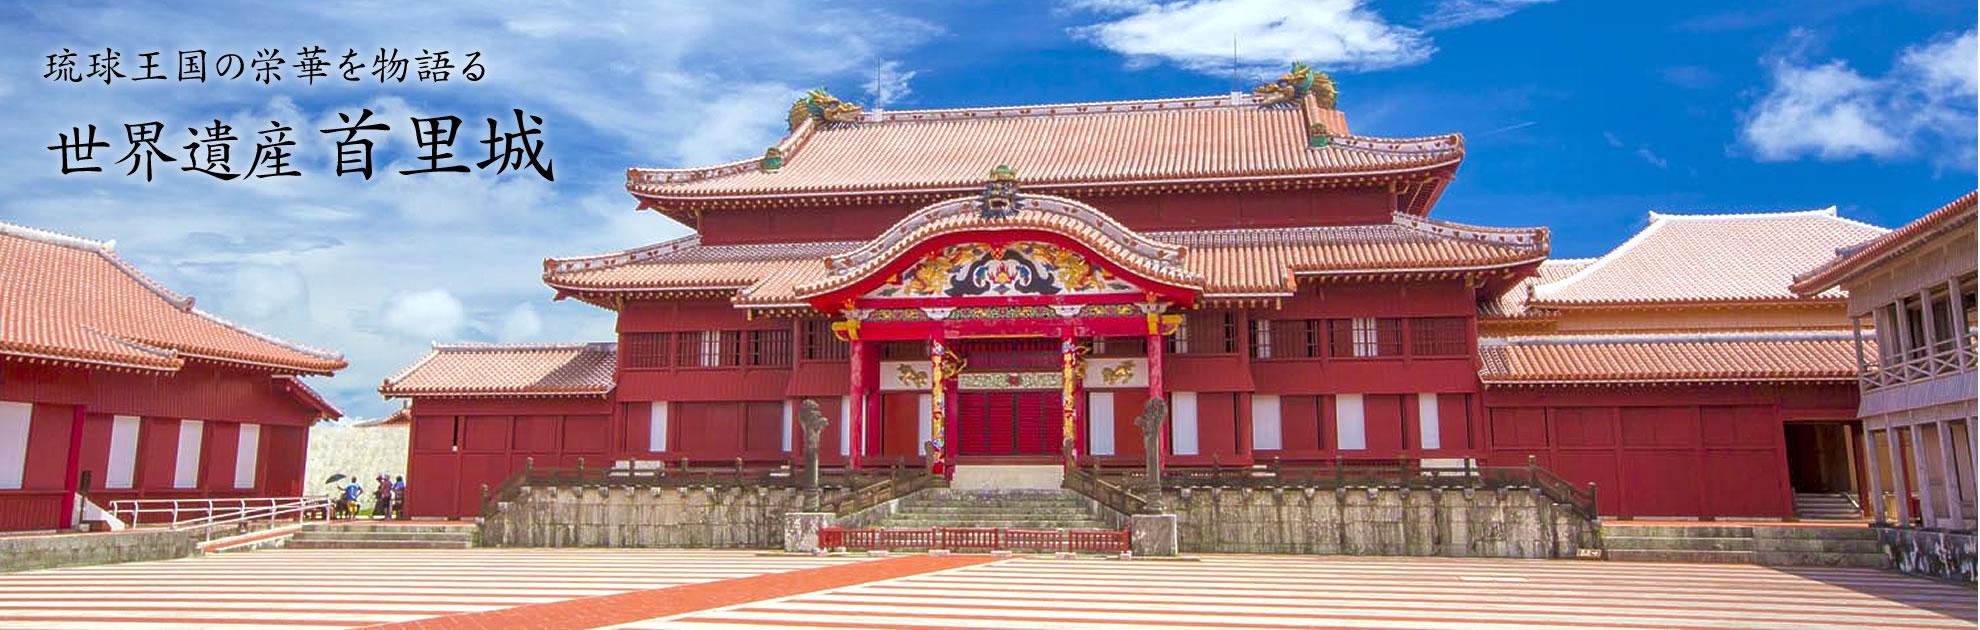 World heritage Shurijo Castle which shows glorification of Ryukyu kingdom